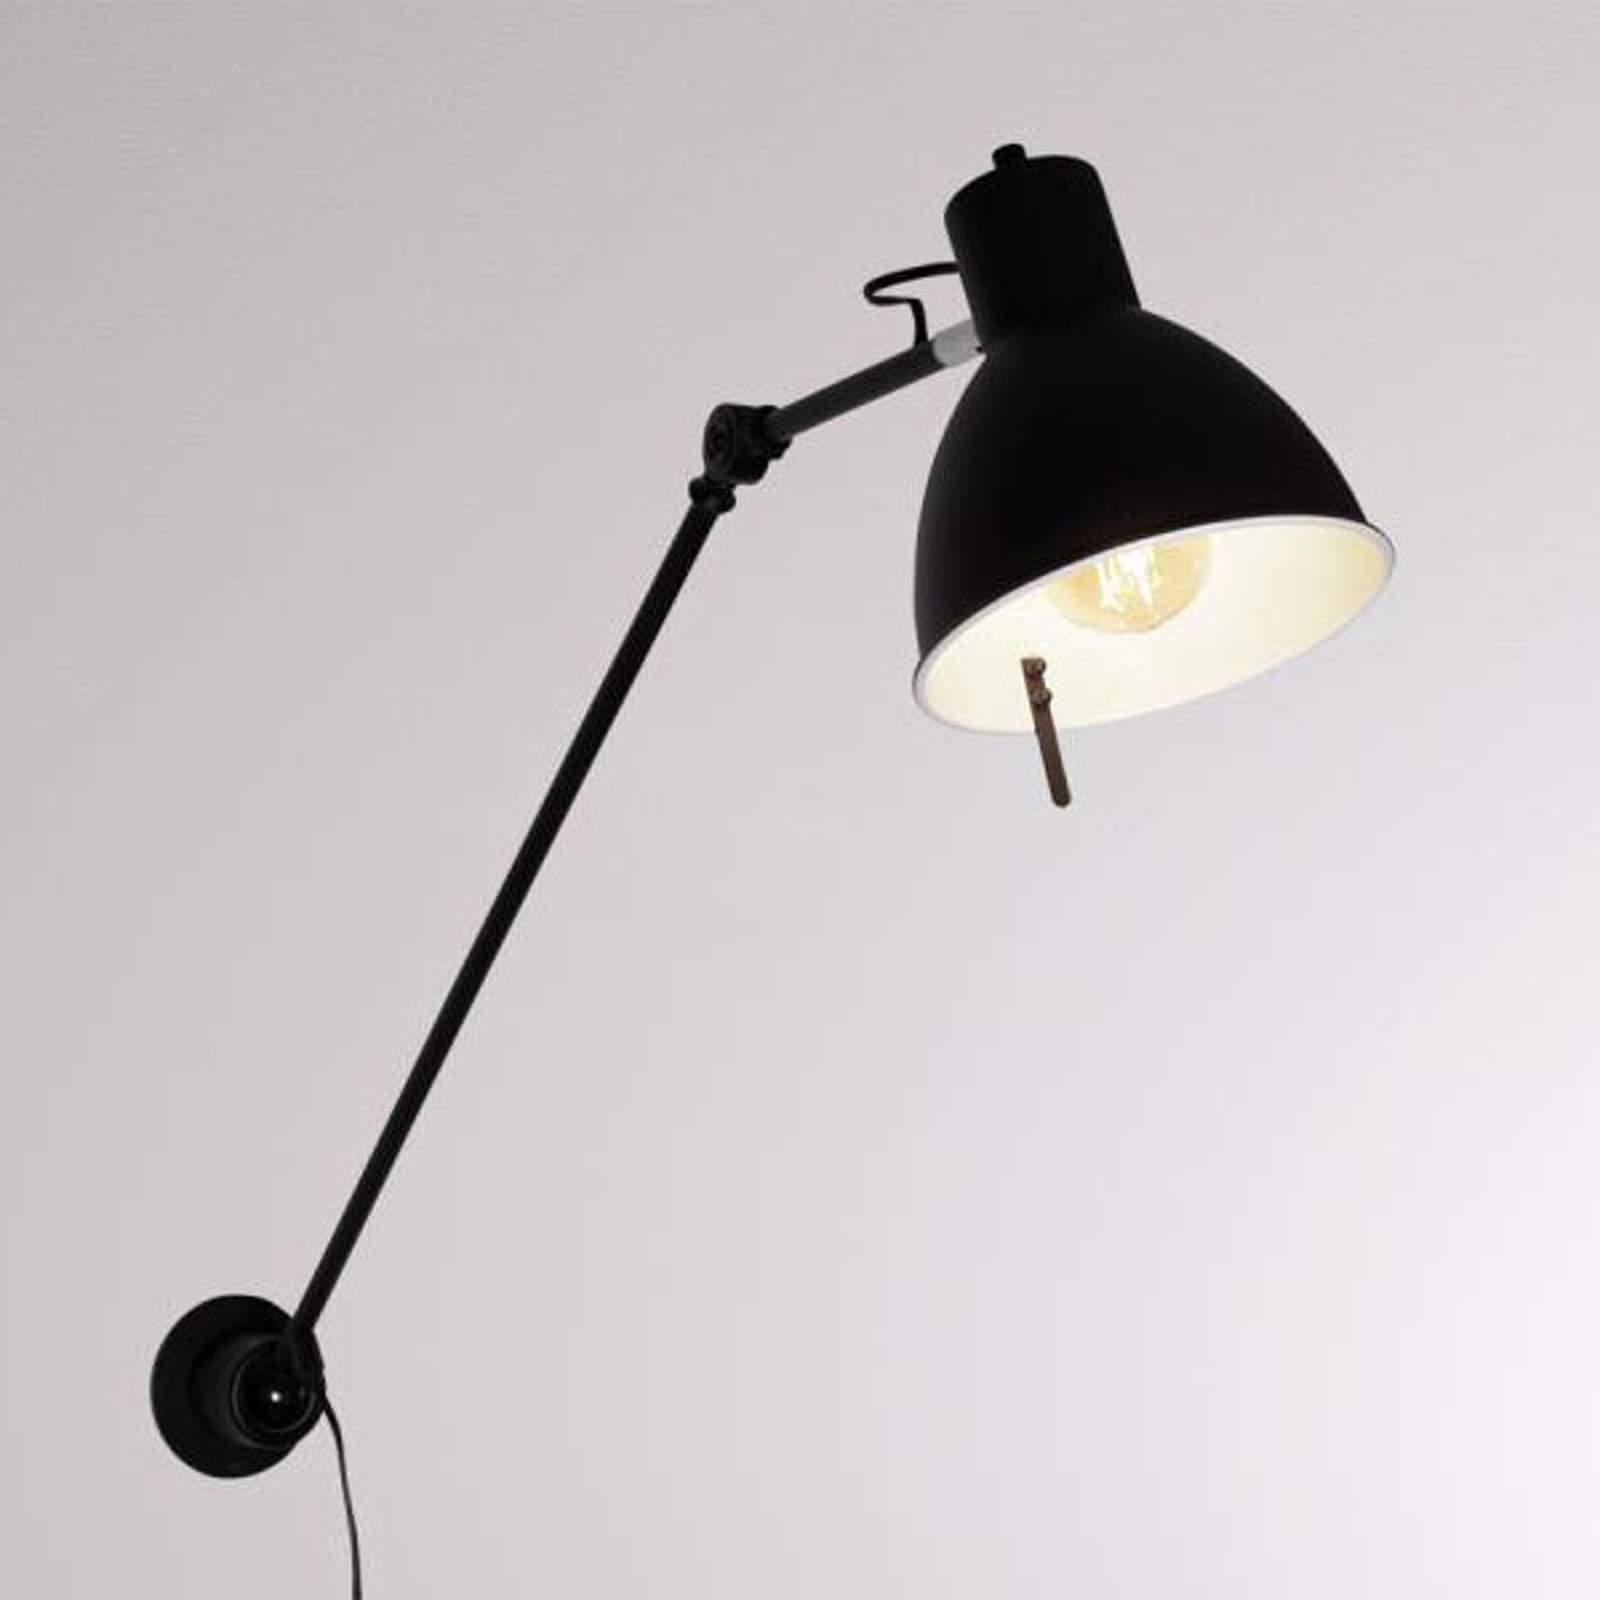 LOUM Iwo 2 wandlamp met stekker bereik 106,6cm